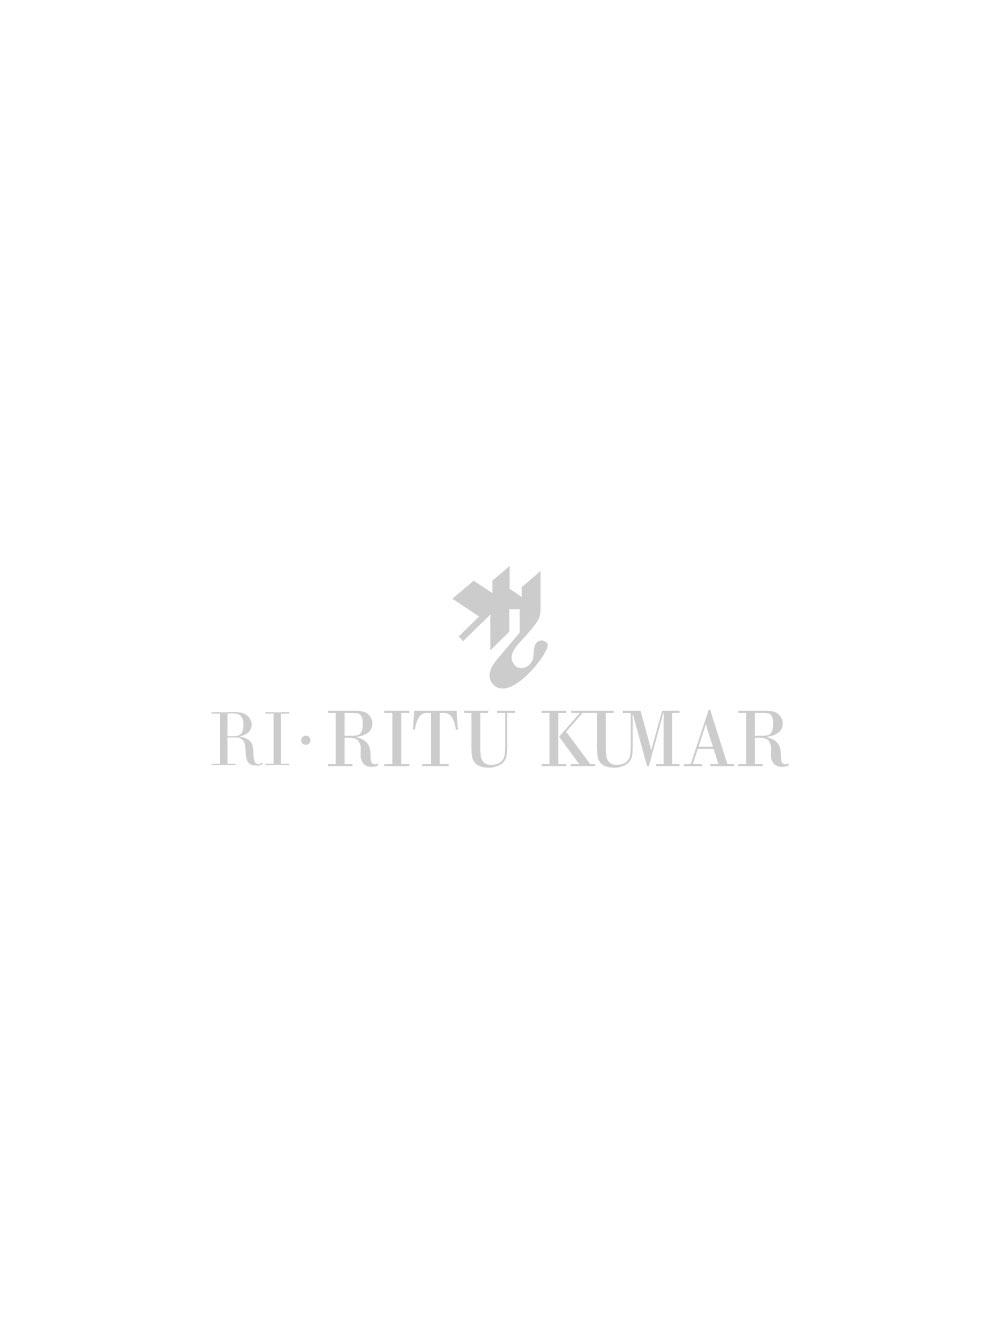 Indigo & Turquoise Embroidered Kurta With Dupatta And Churidar